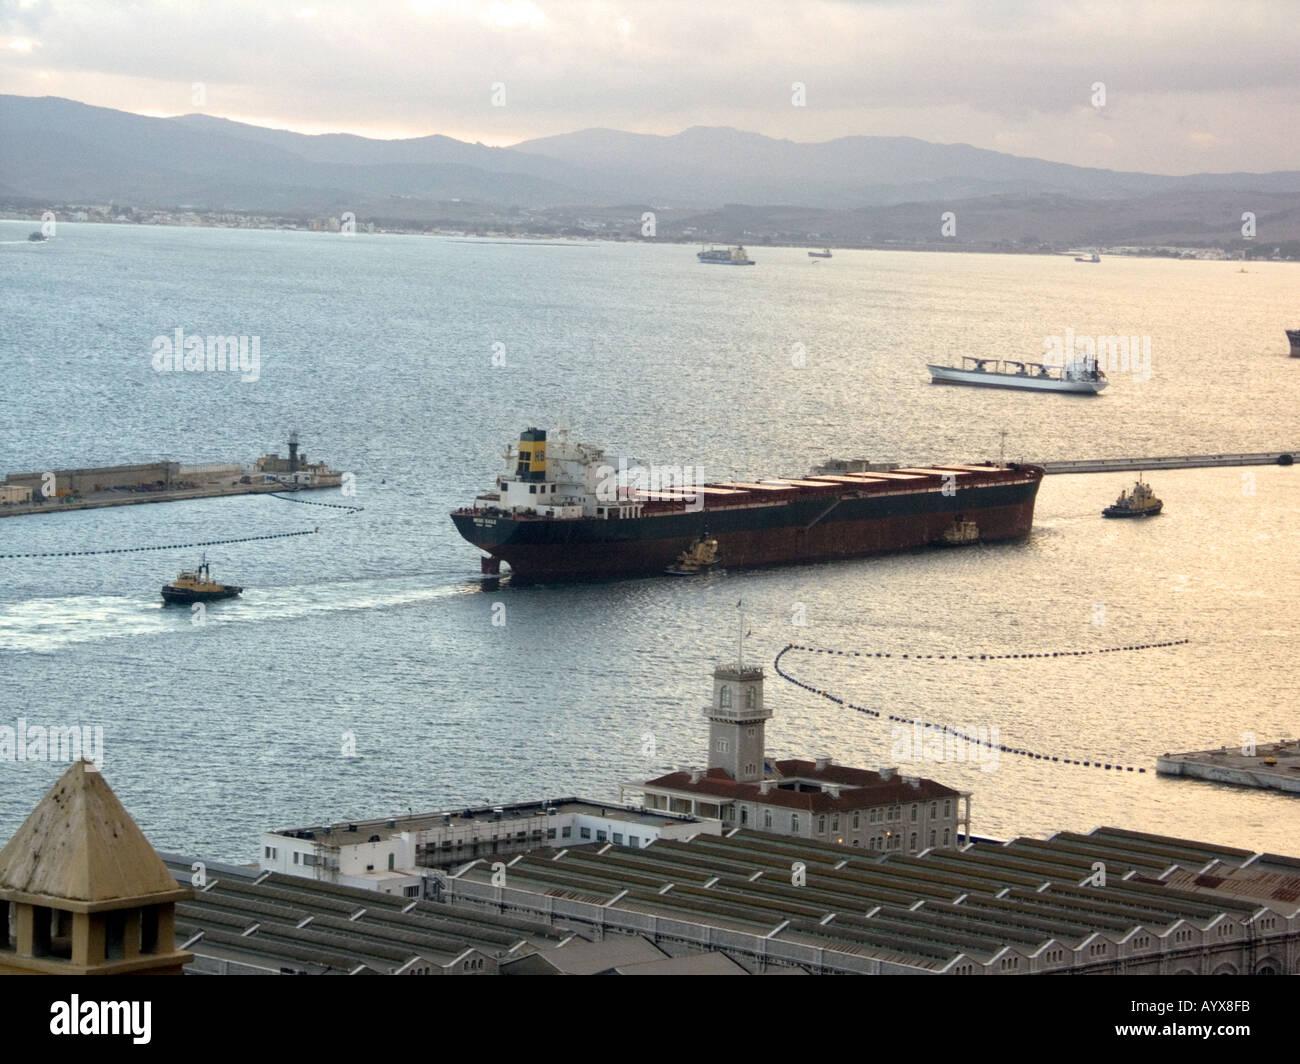 Sunset over The Bay of Gibraltar Shipyard - Stock Image